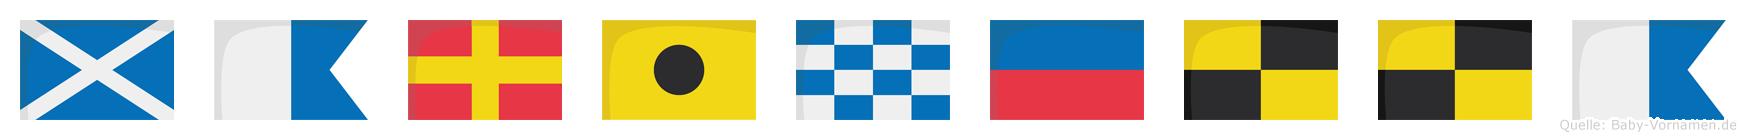 Marinella im Flaggenalphabet